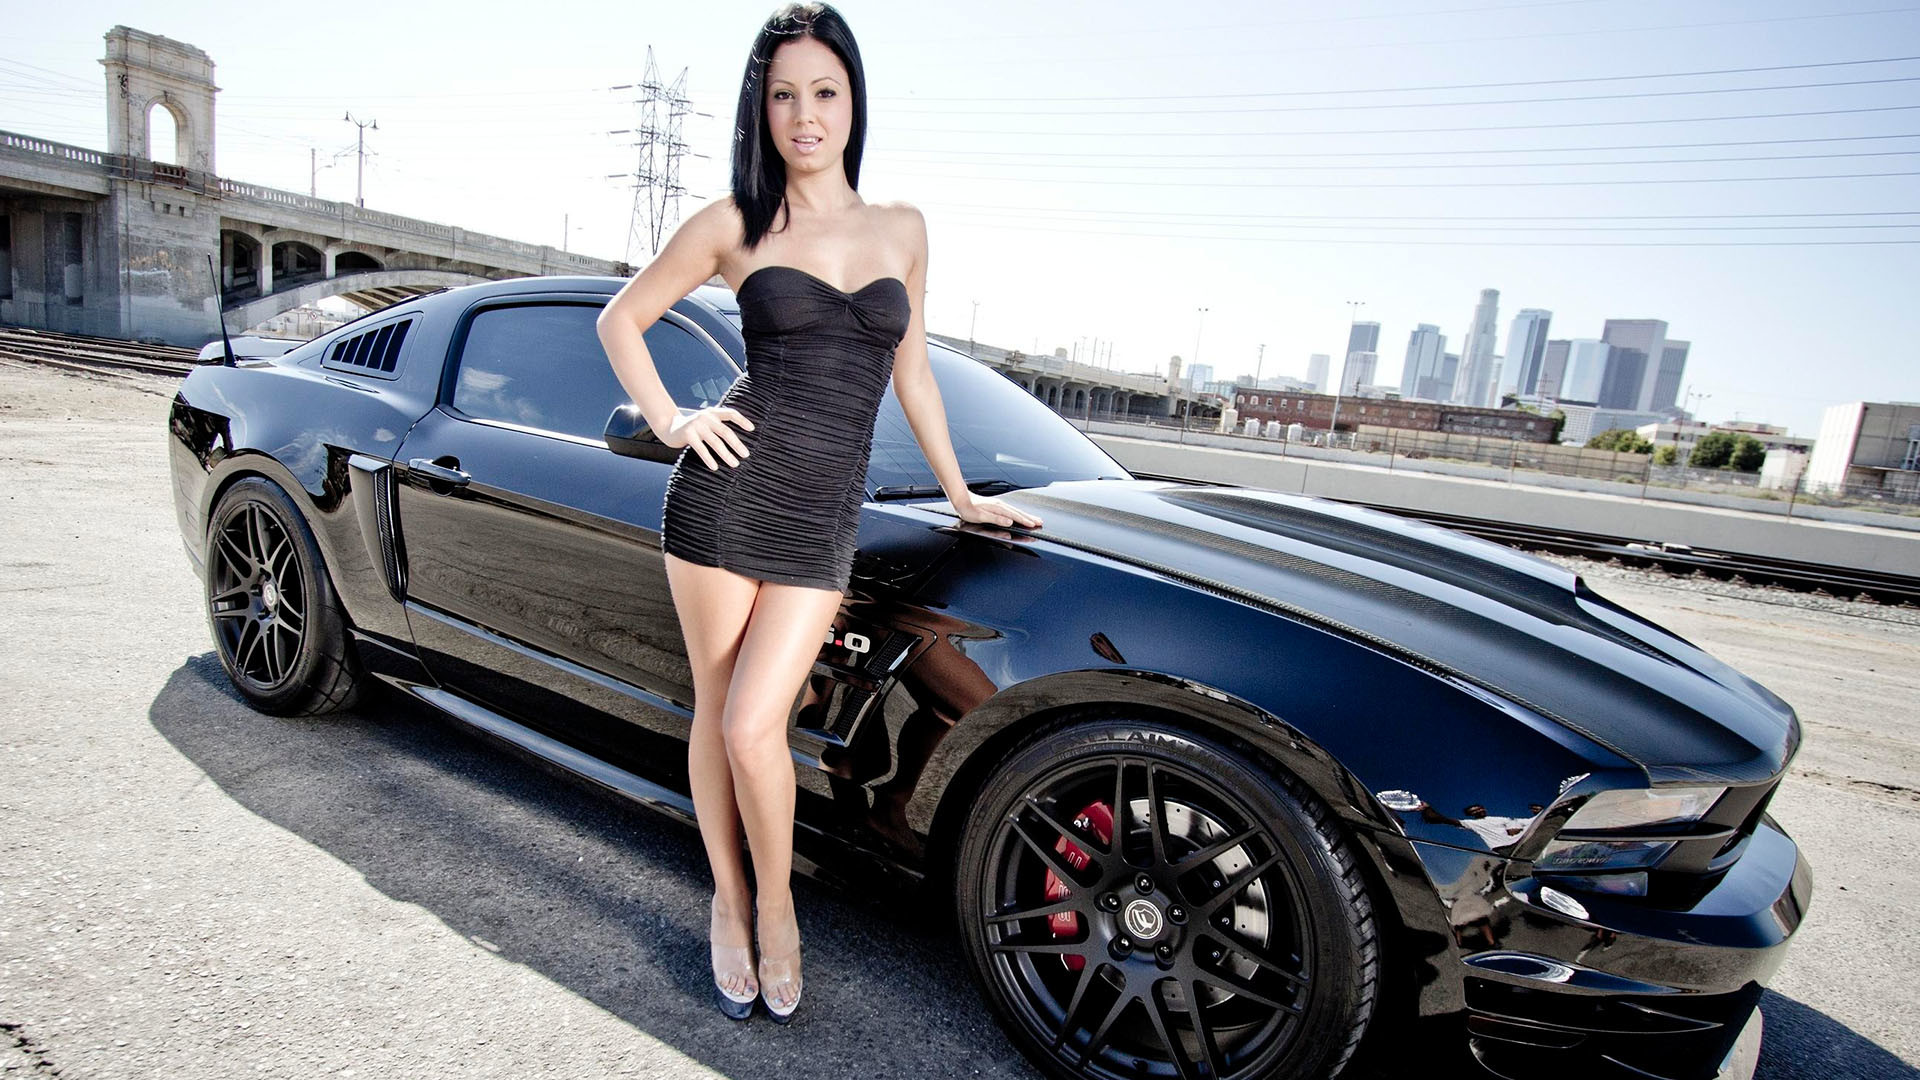 Mustangs Girls Stang – Bing images | 2005 to 2014 Mustangs (5th Gen) |  Pinterest | Mustang girl and 2014 mustang